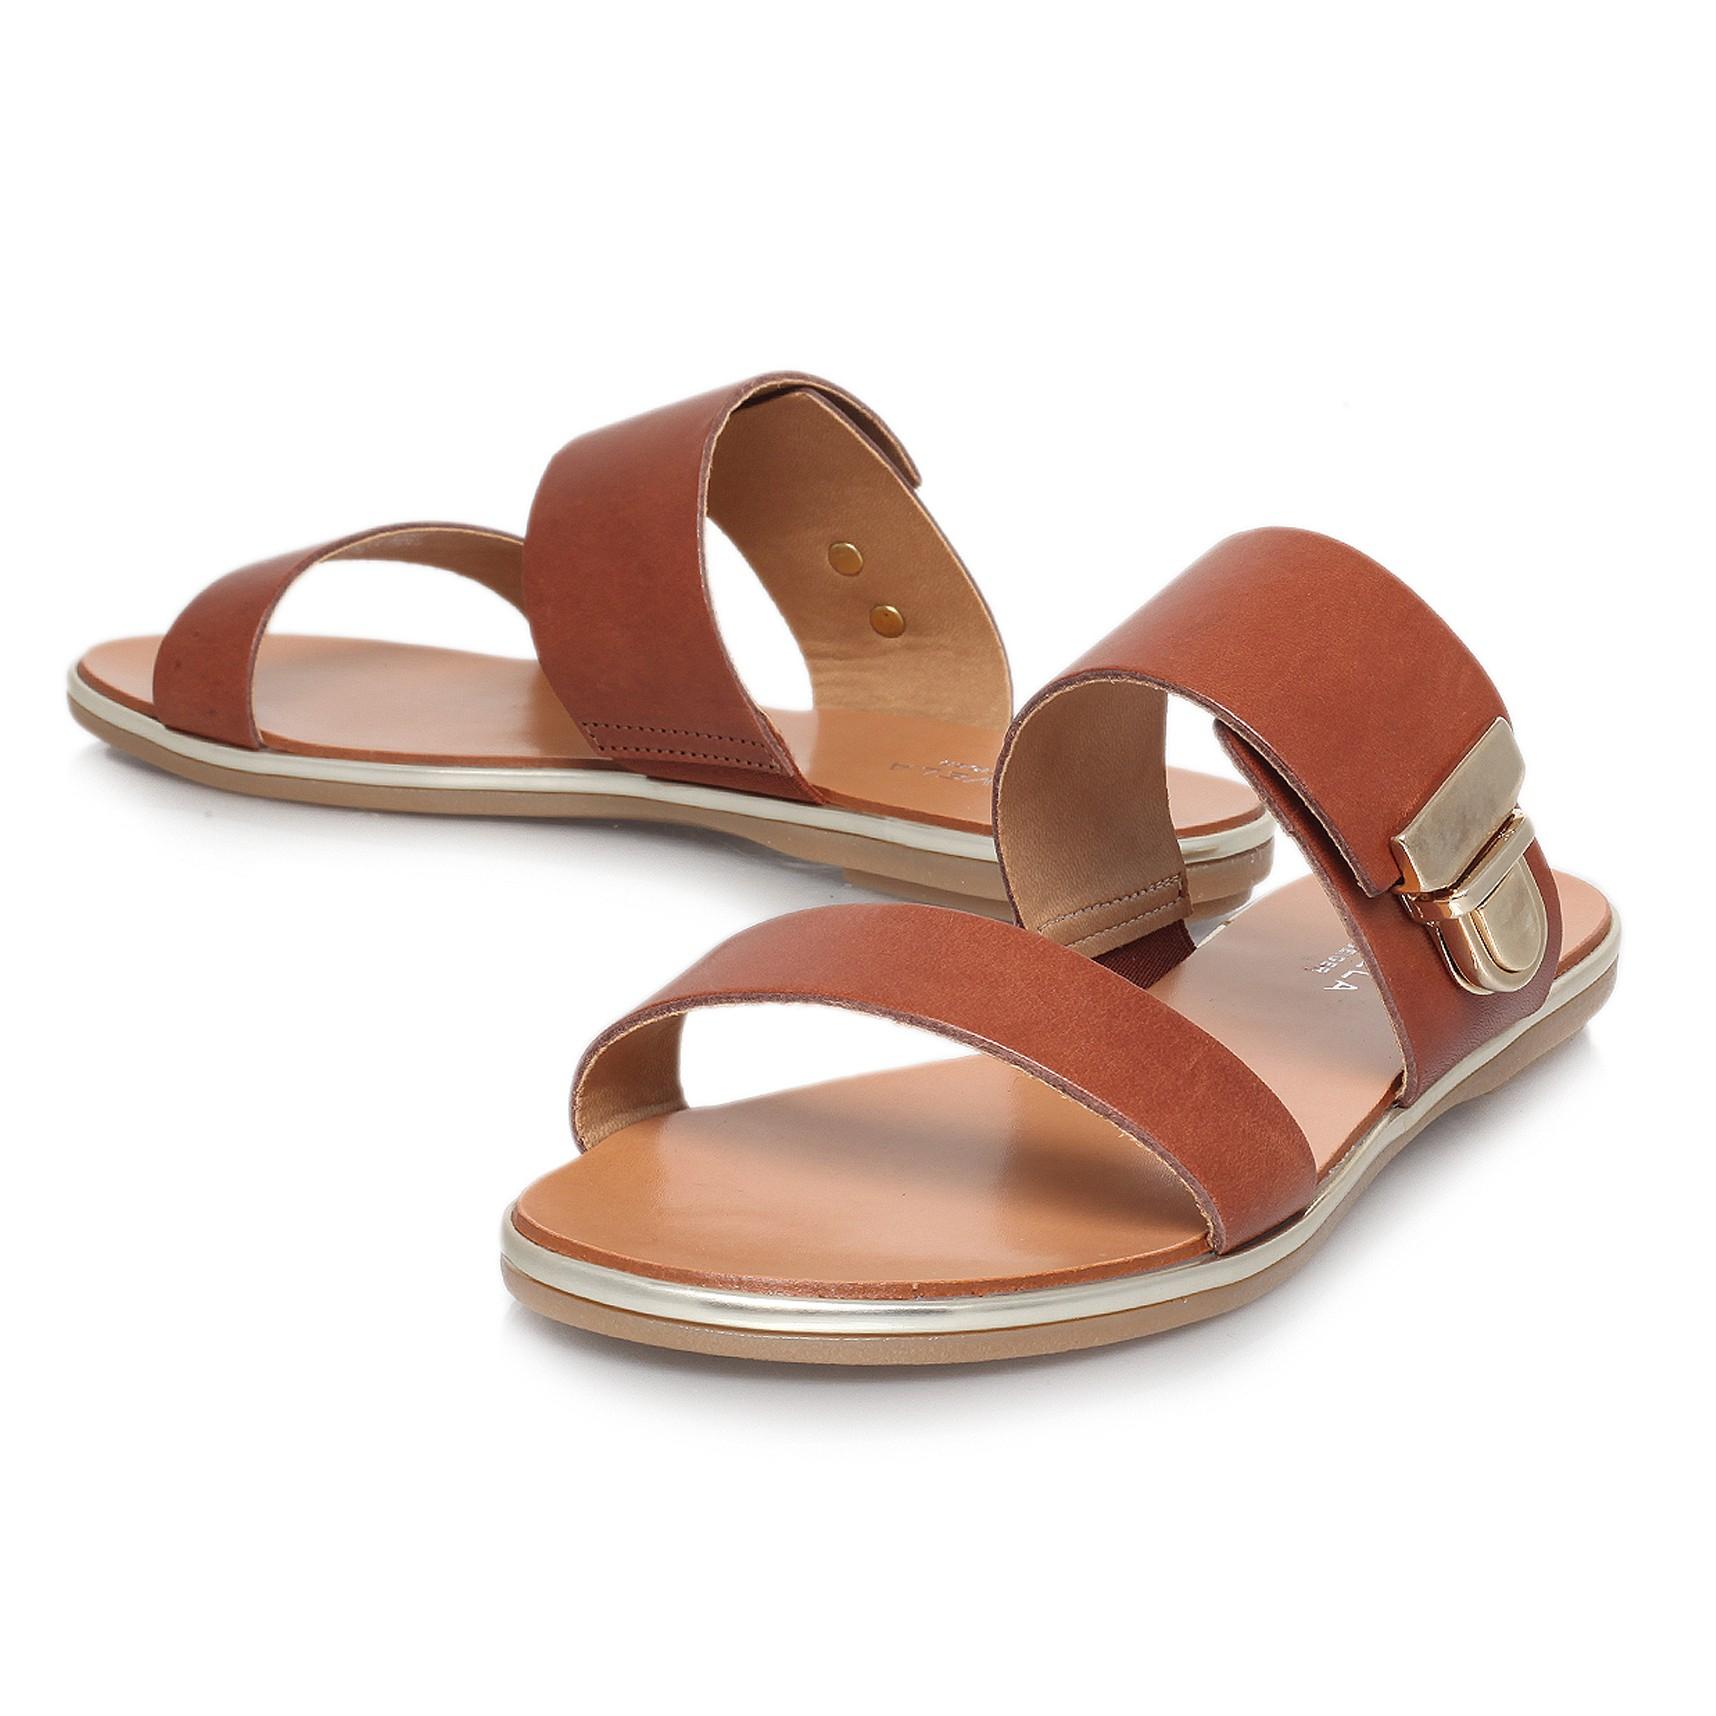 572d83691dbcab Carvela Kurt Geiger Kall Flat Leather Sandals in Brown - Lyst